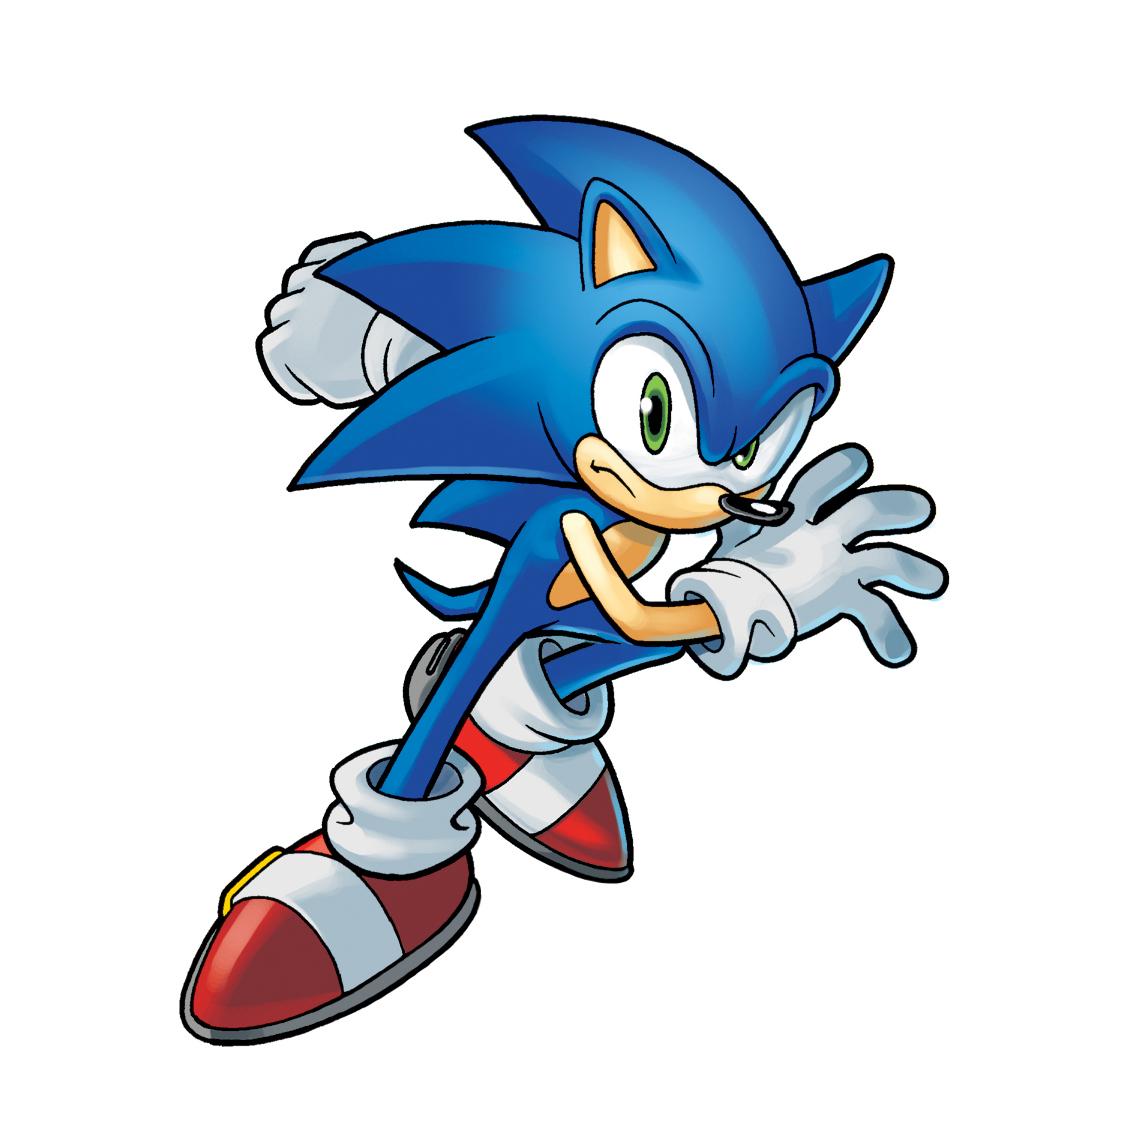 Sonic the Hedgehog/Pre-SGW